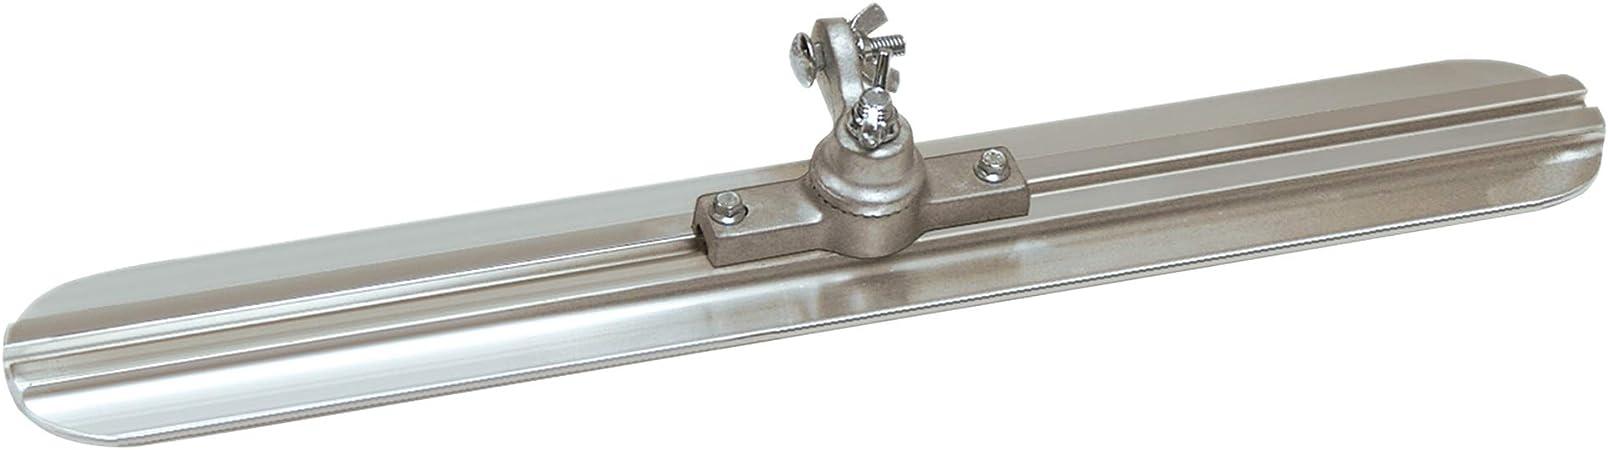 "Kraft Tool CC814 Walking Concrete Float Magnesium 24/"" x 3.25/"" 2x New"